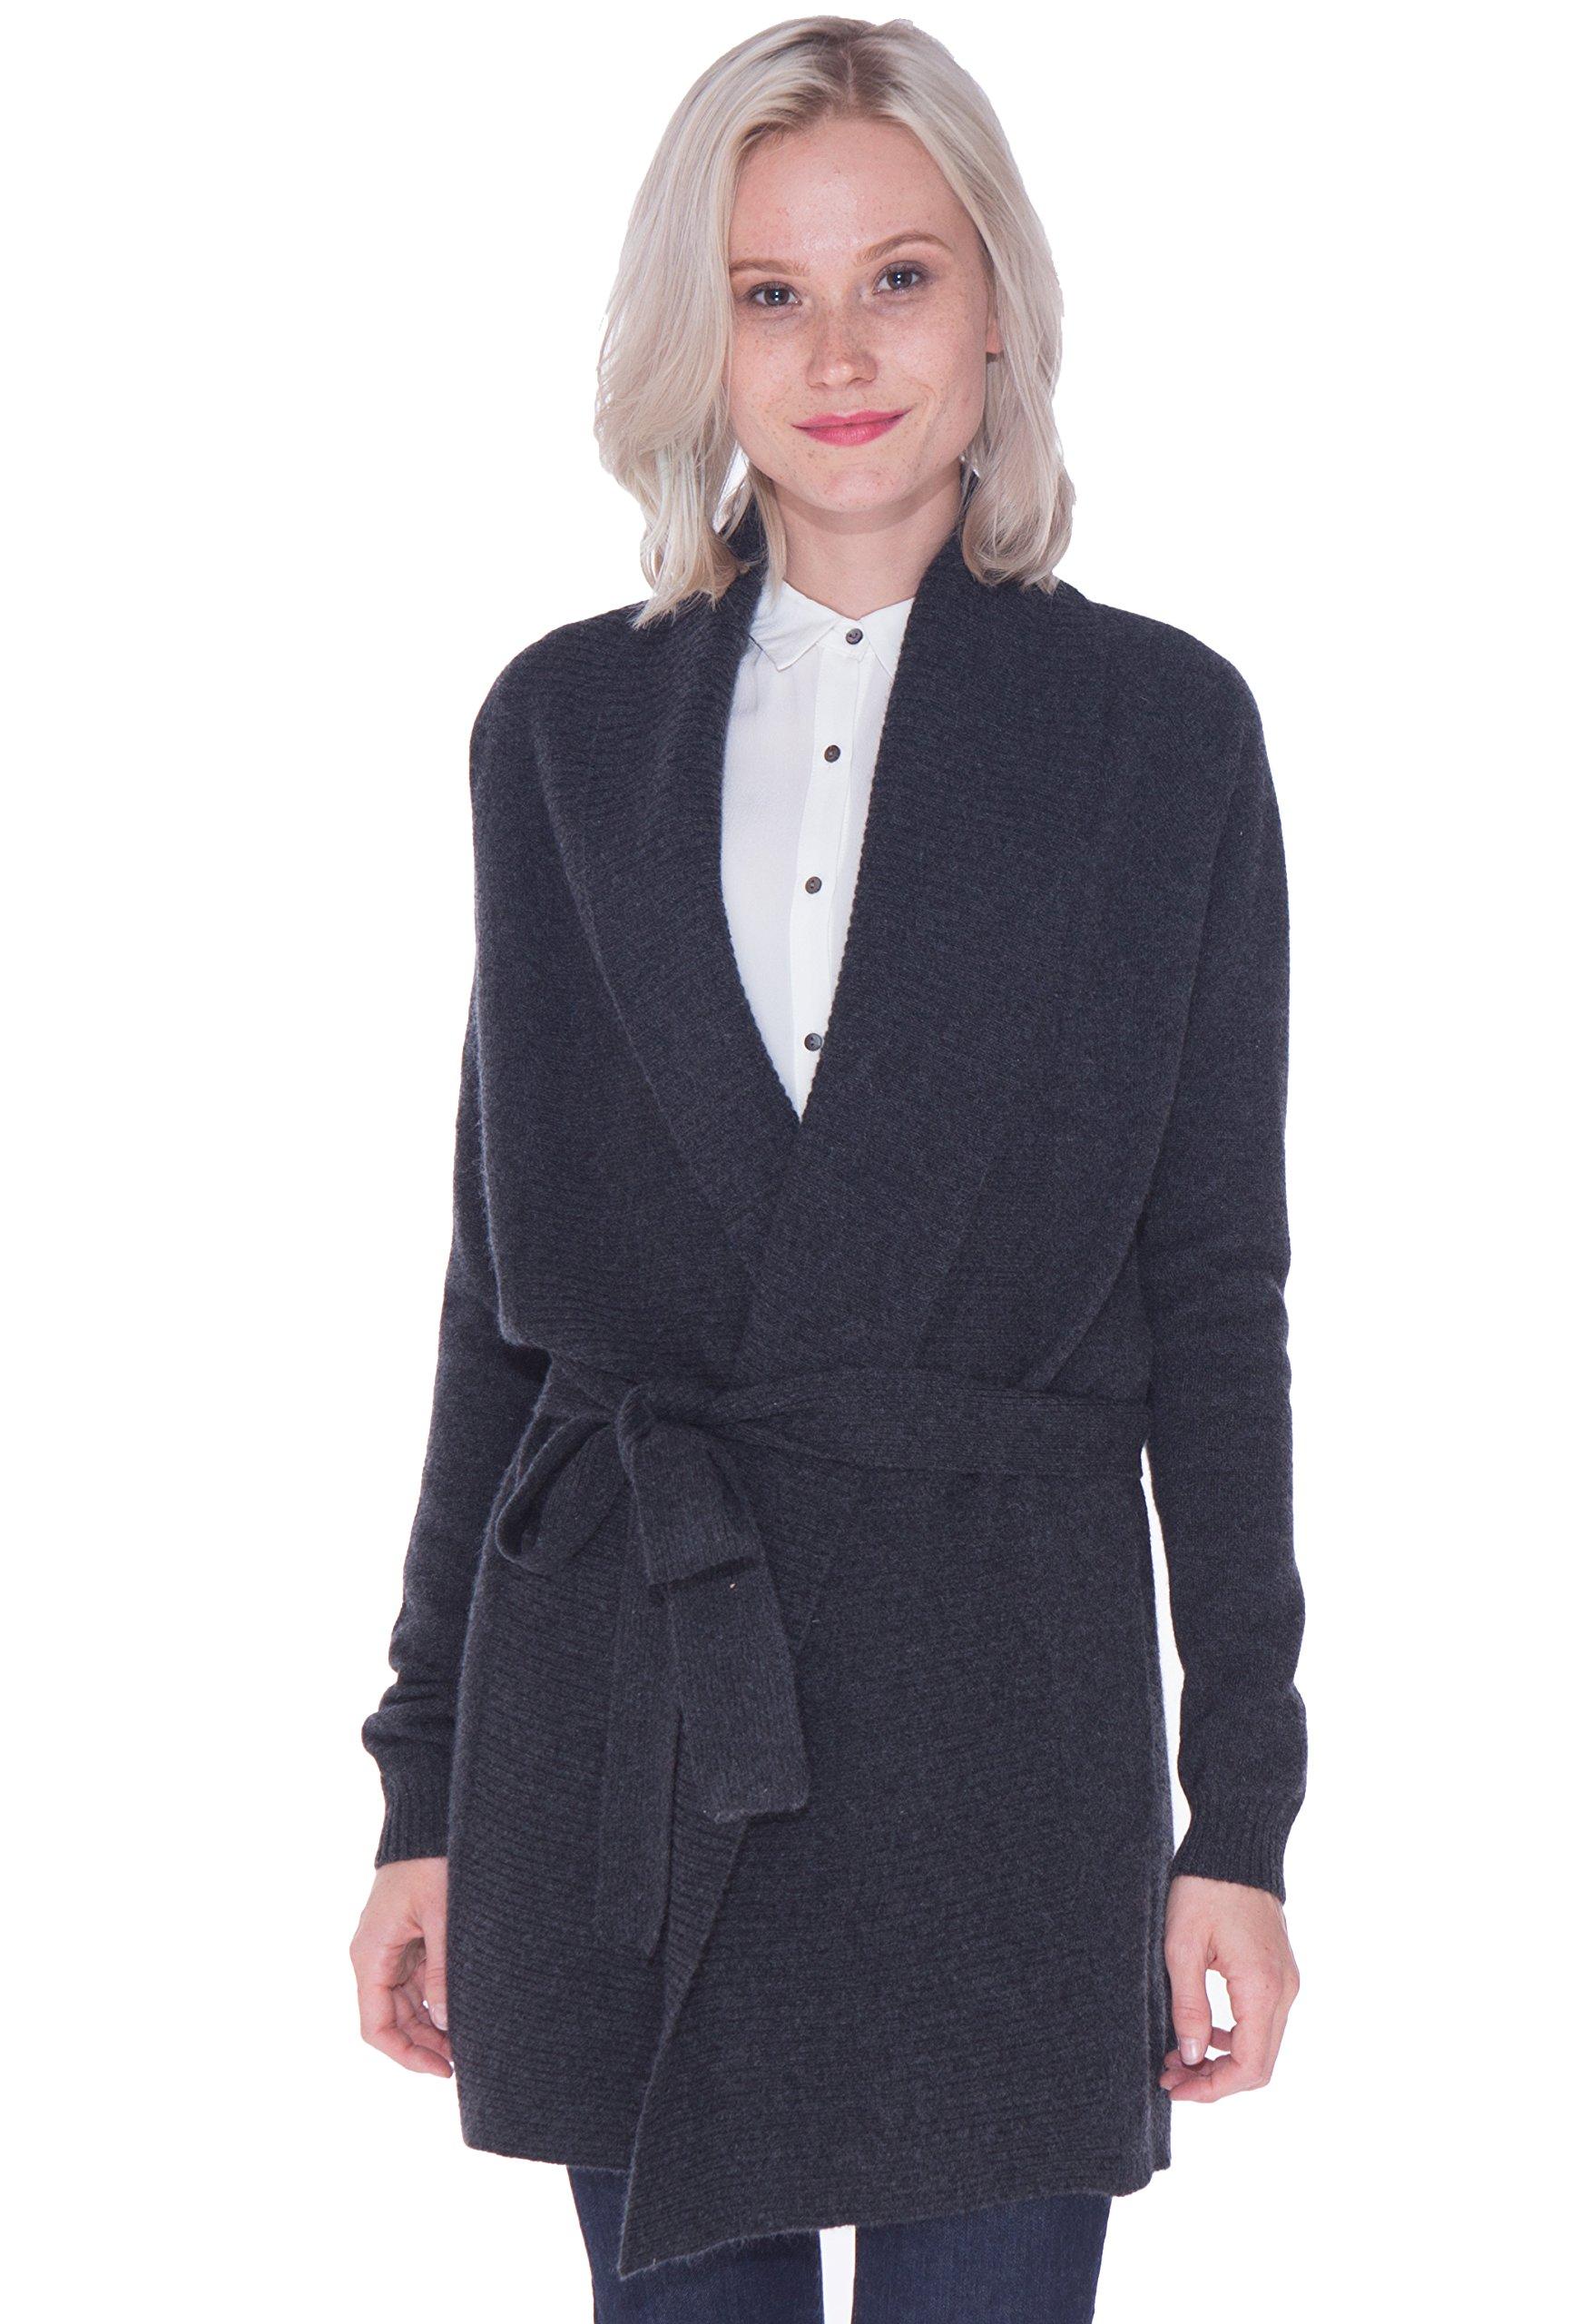 LEBAC Women's 100% Cashmere Ribbed Shawl Collar Long Cardigan Waist Tie Jacket by LEBAC